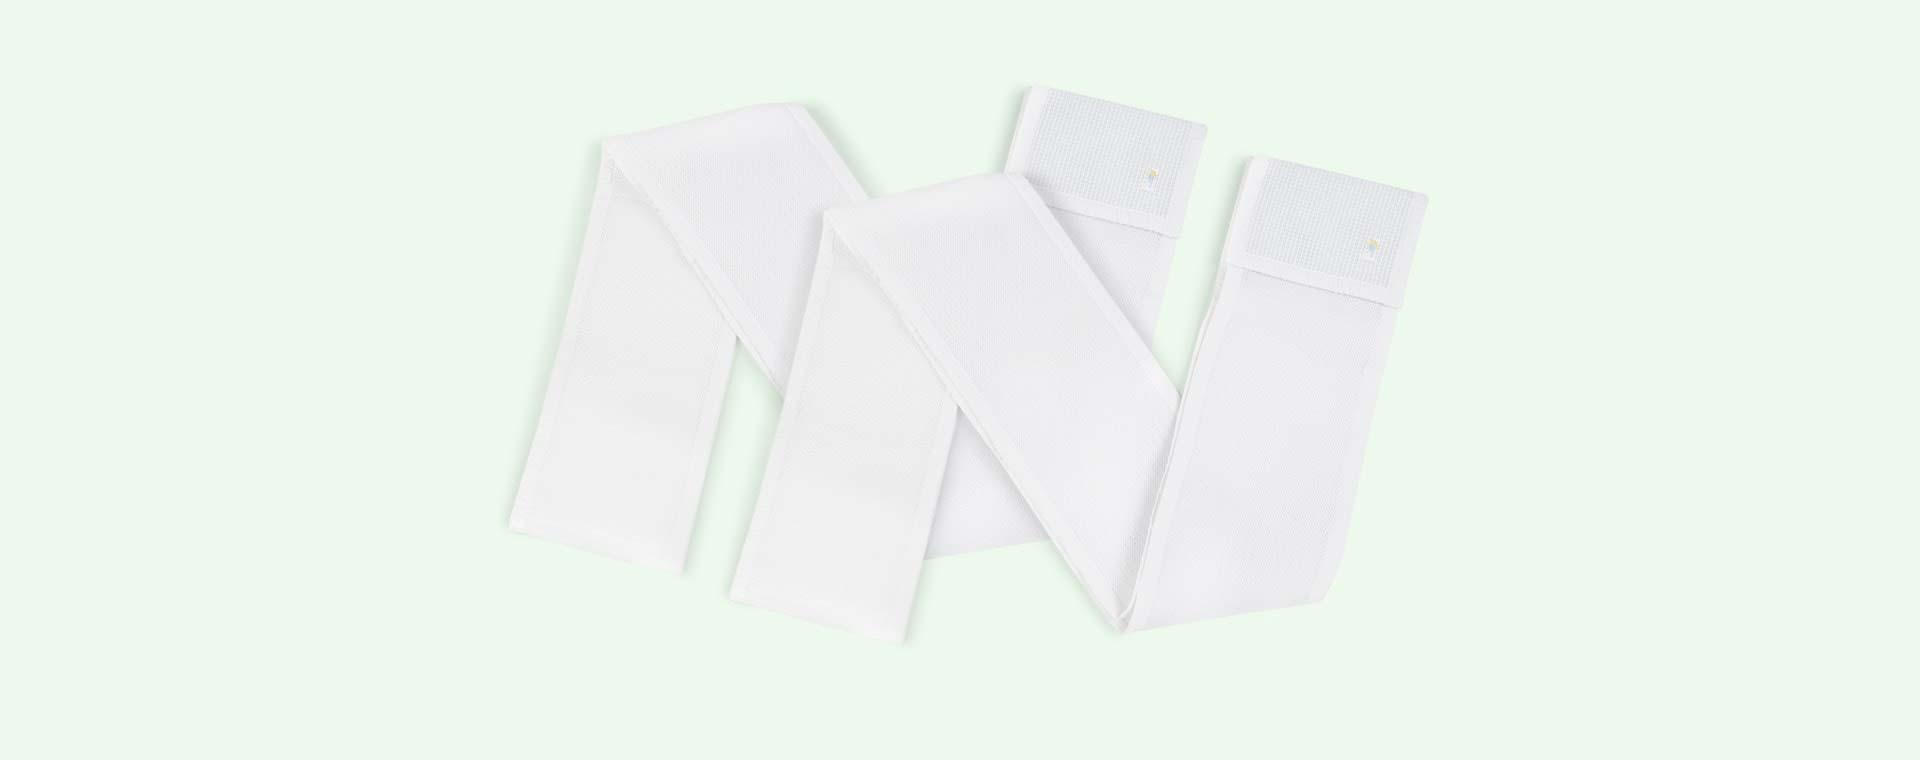 White babybundle Safe Dreams 4 sided Cotwrap Bumper